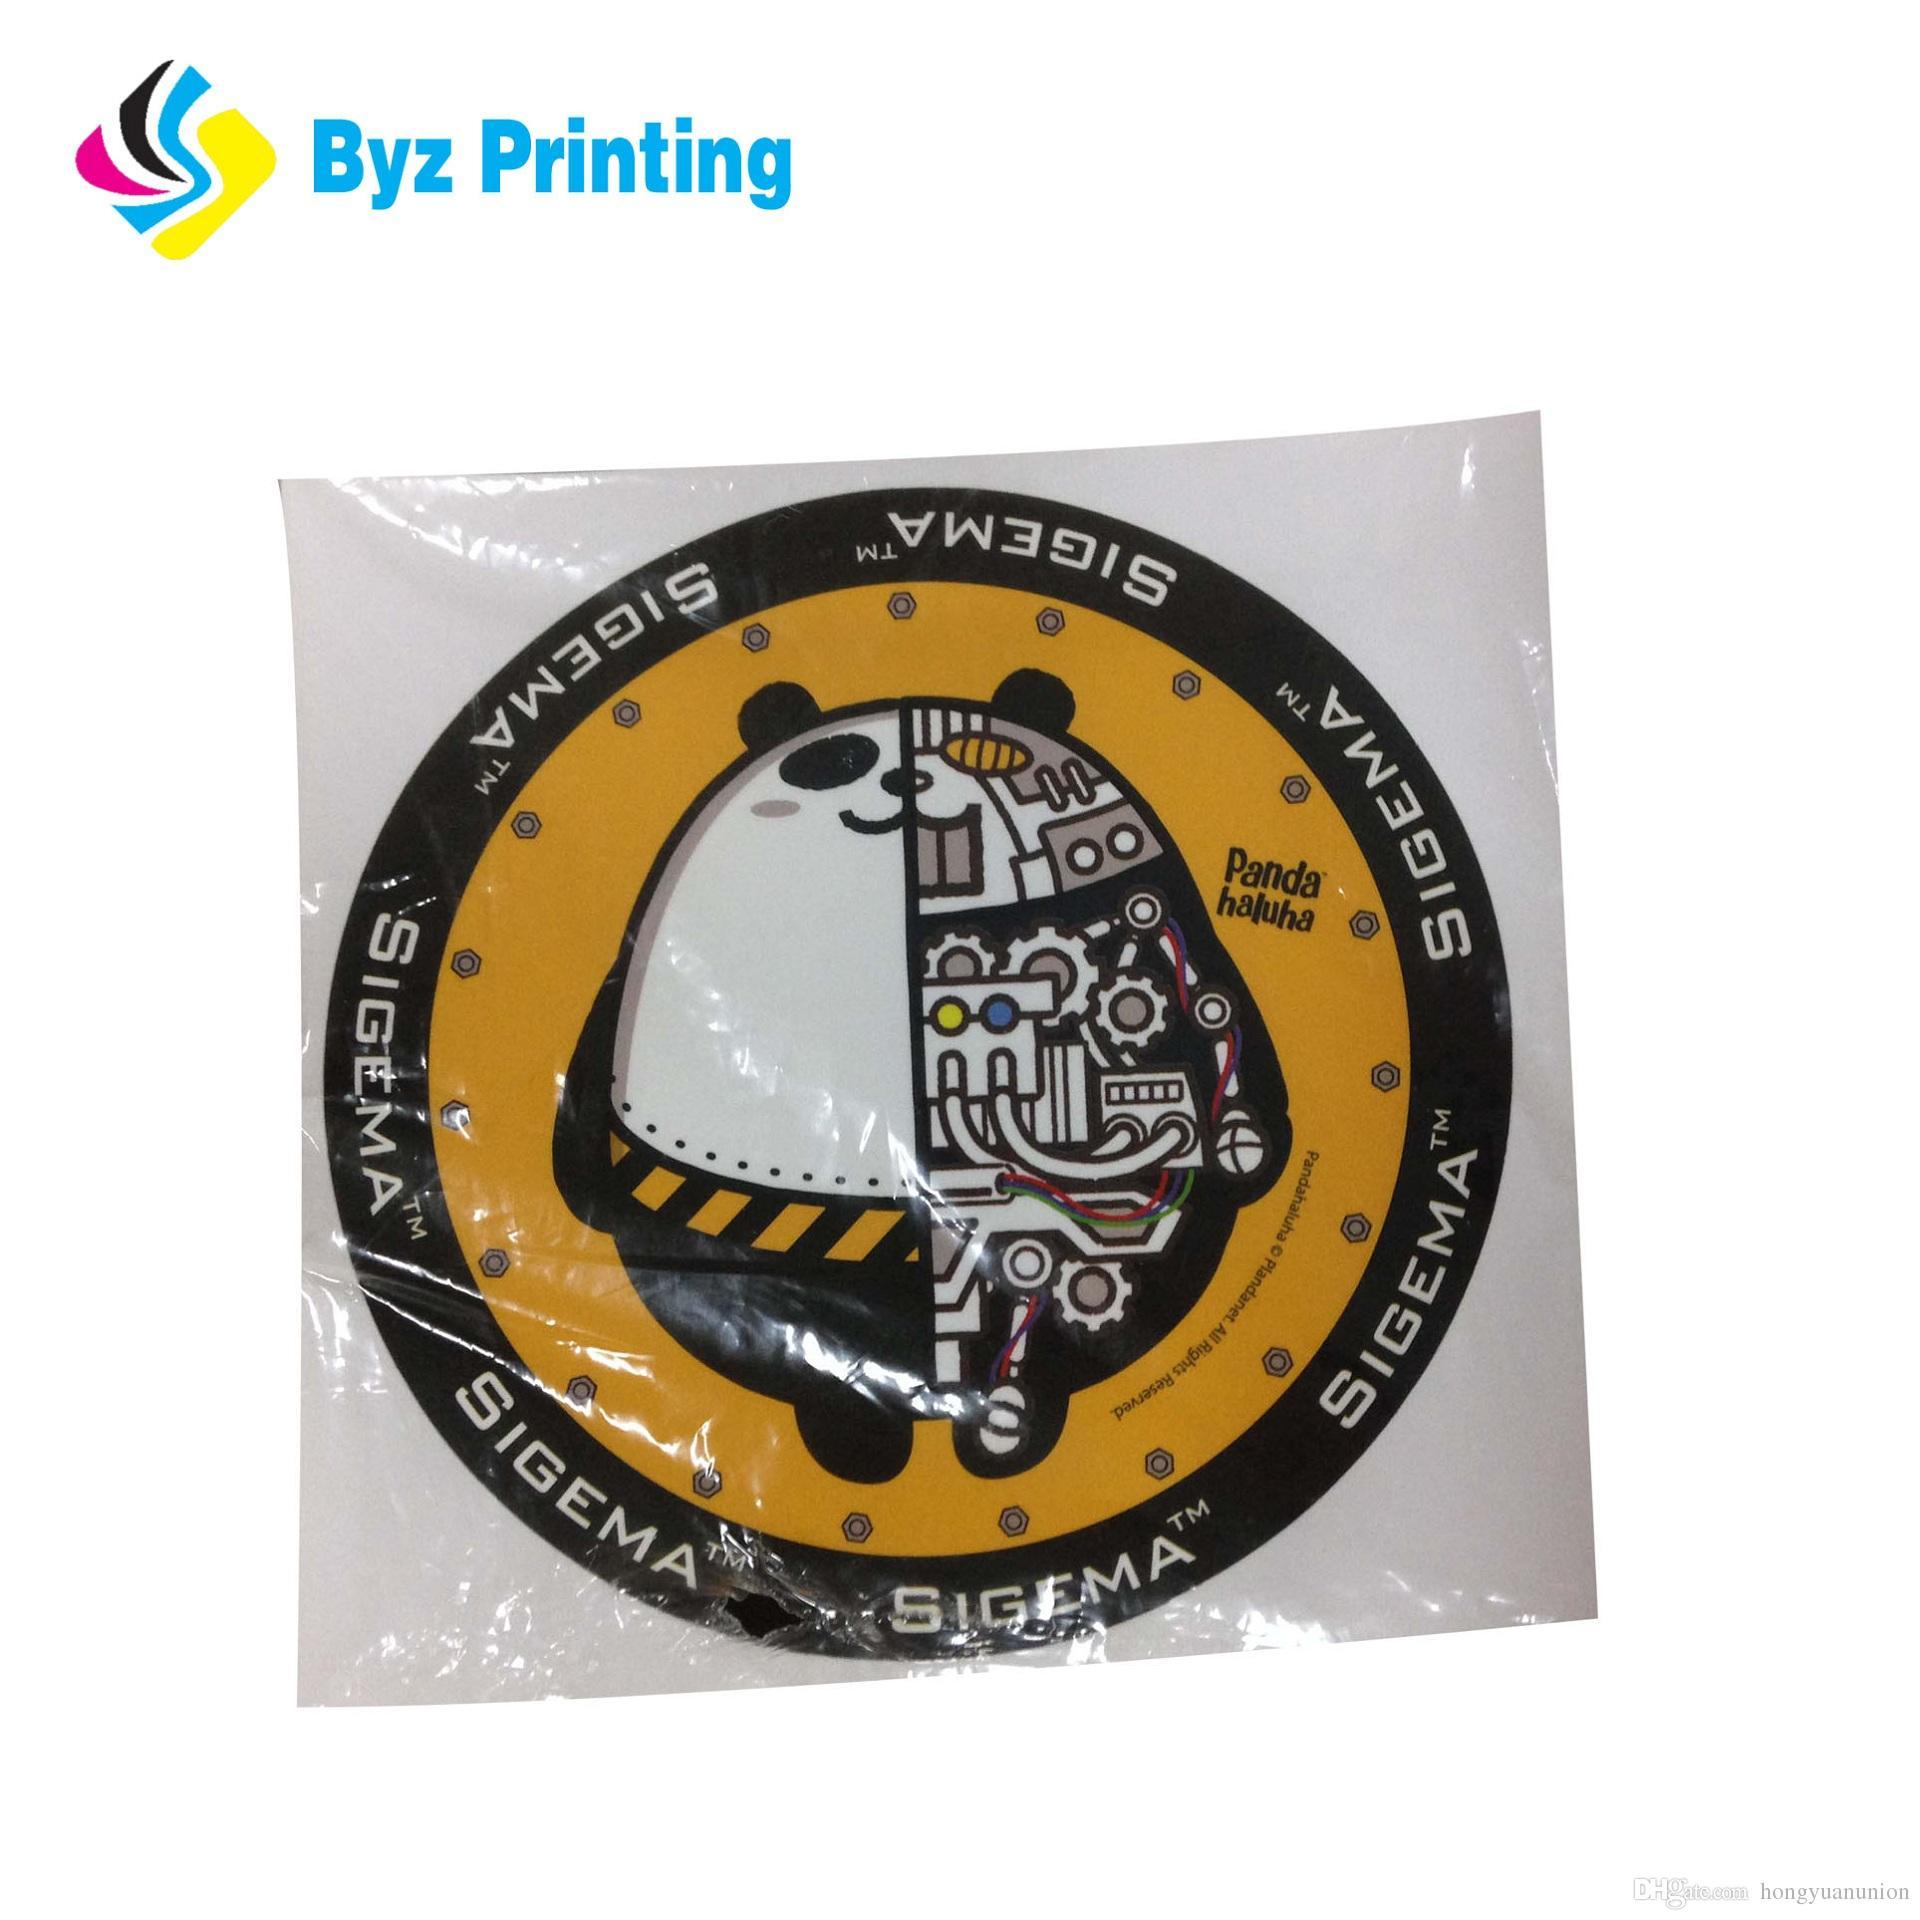 2019 custom made good quality die cut car bumper stickerdie cut sticker printing from hongyuanunion 0 04 dhgate com